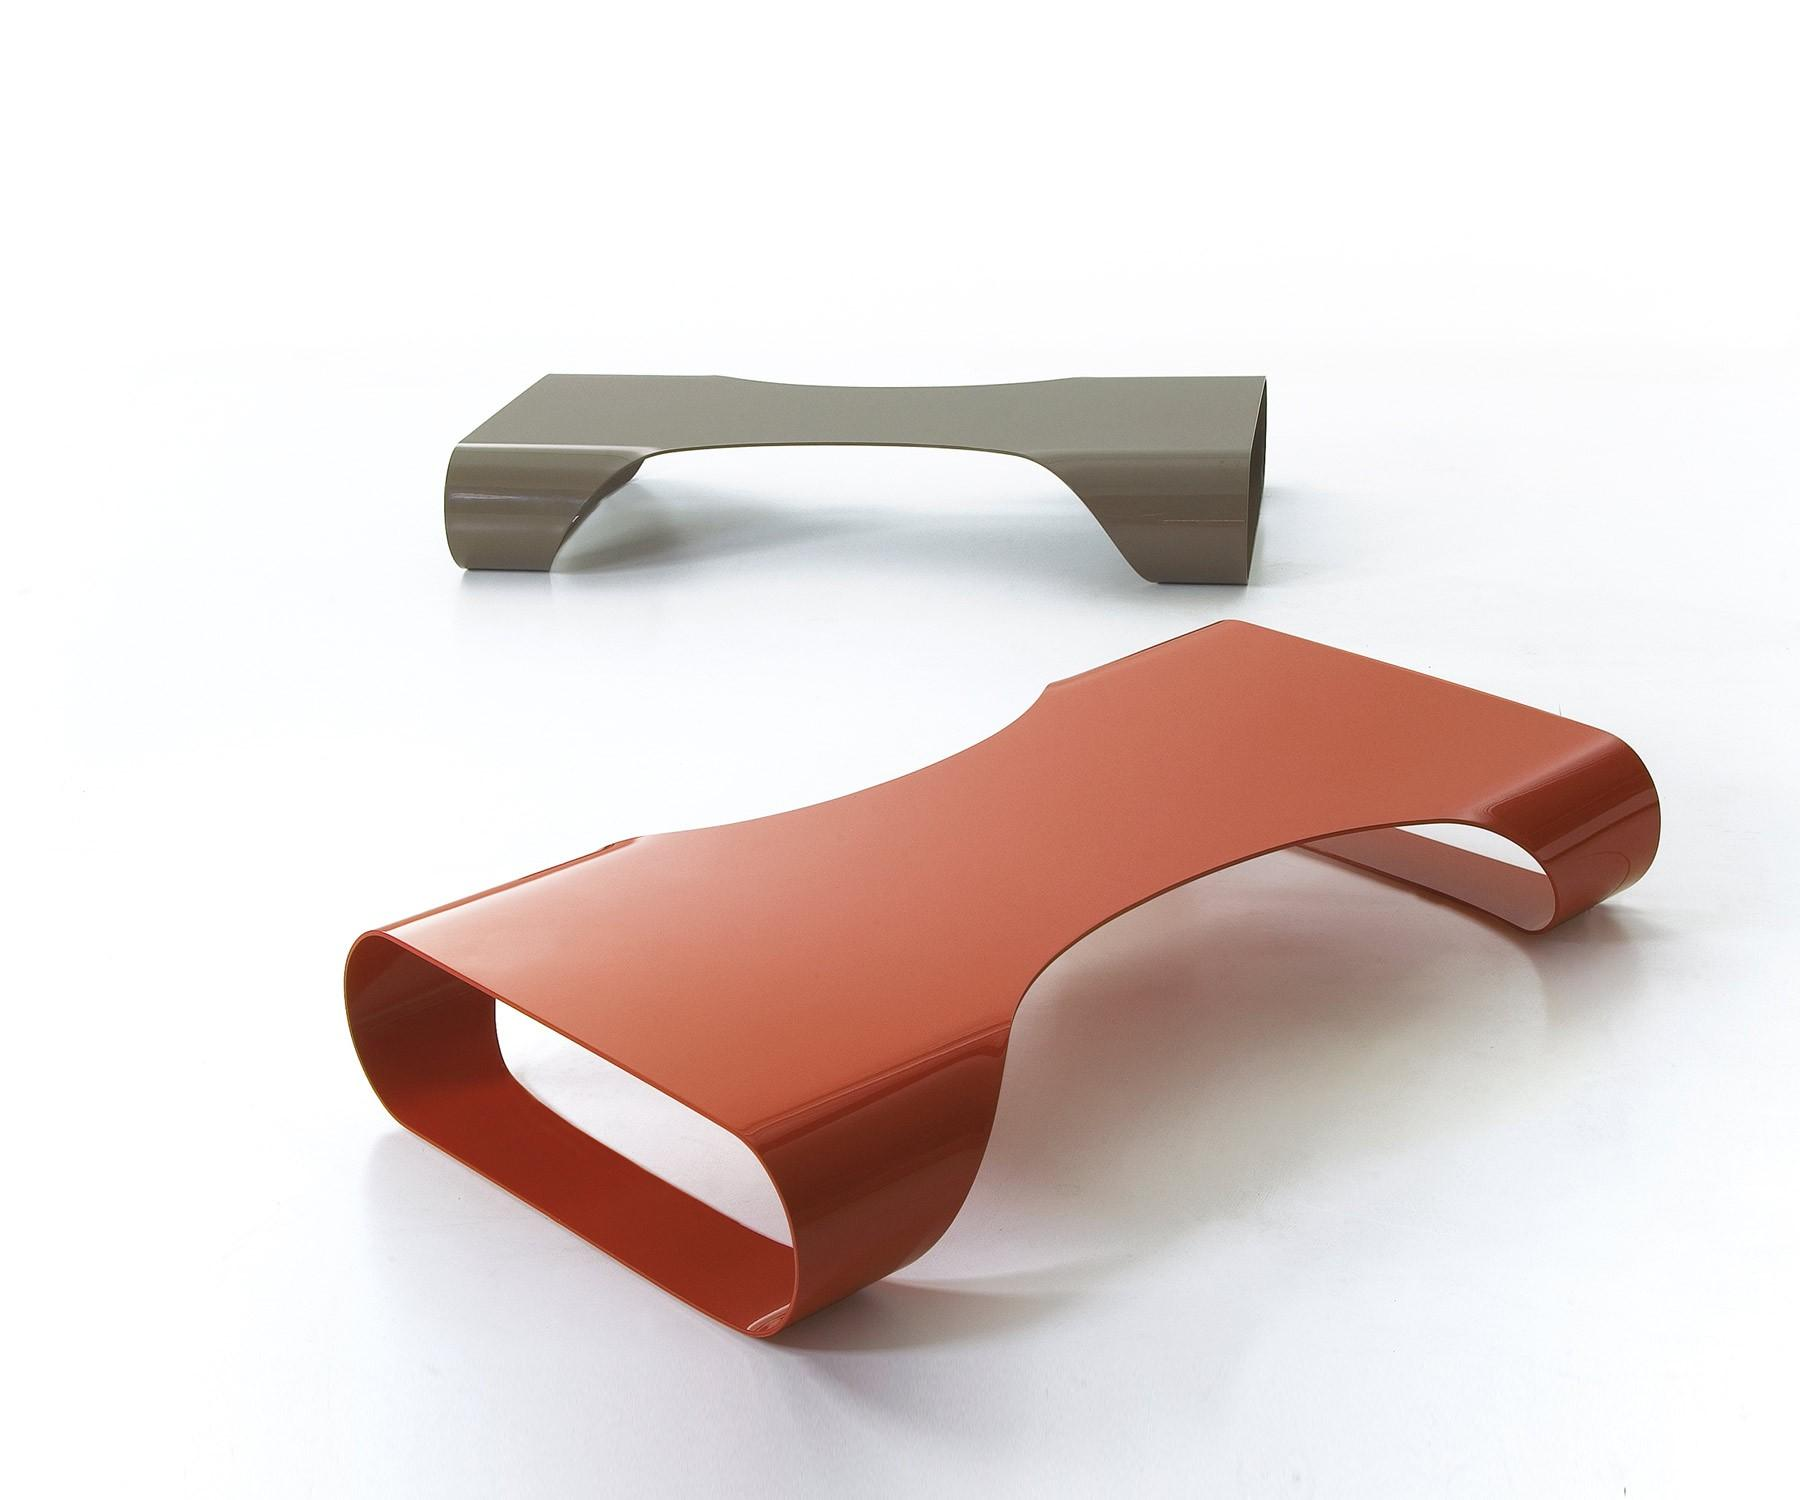 SpHaus Lite Couchtisch Aluminiumblech